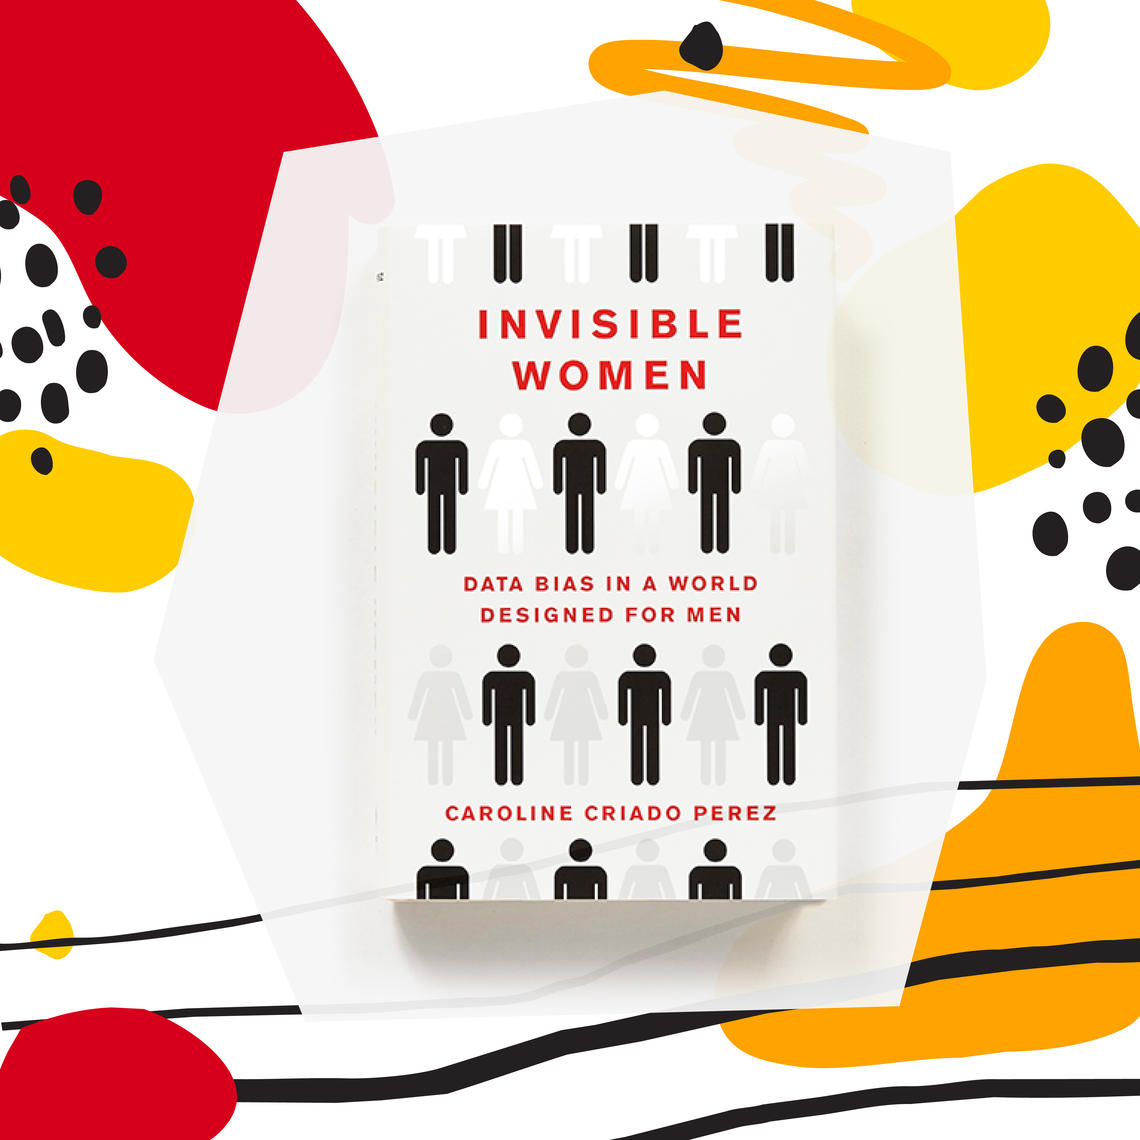 The cover of Invisible Women: Data Bias in a World Designed for Men by Caroline Criado-Perez